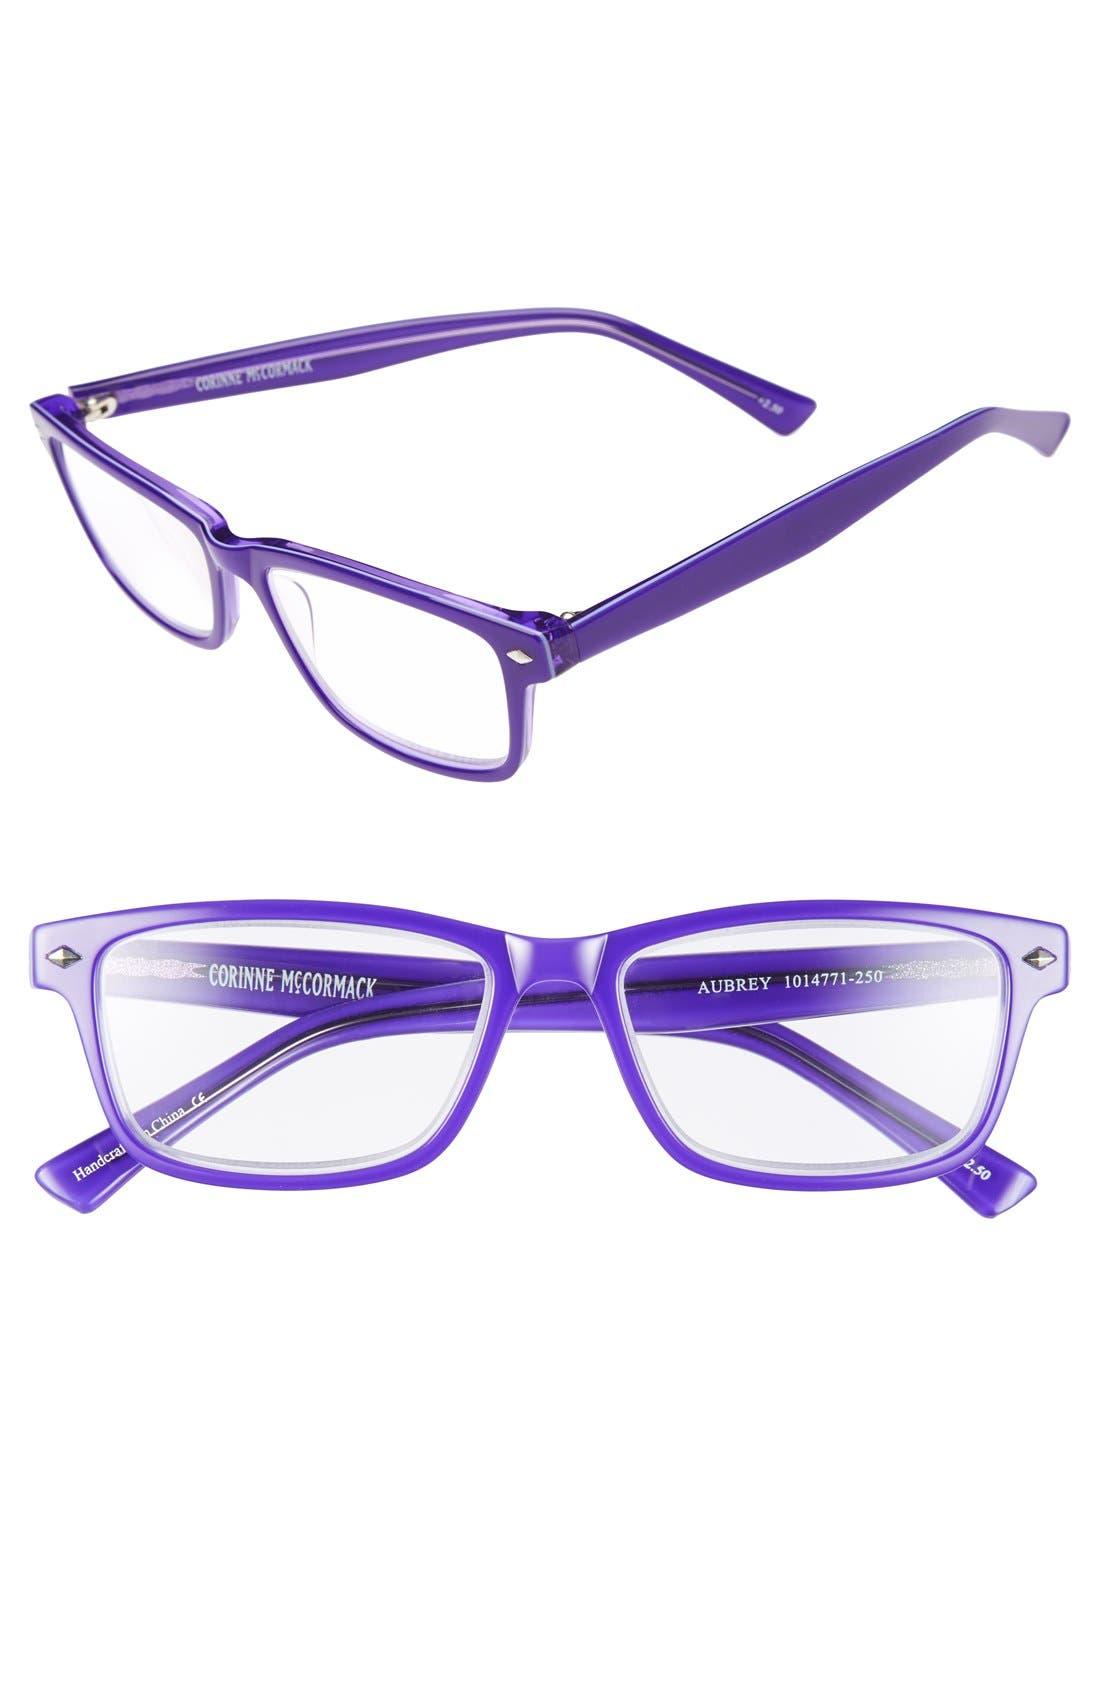 Main Image - Corinne McCormack 'Aubrey' 52mm Reading Glasses